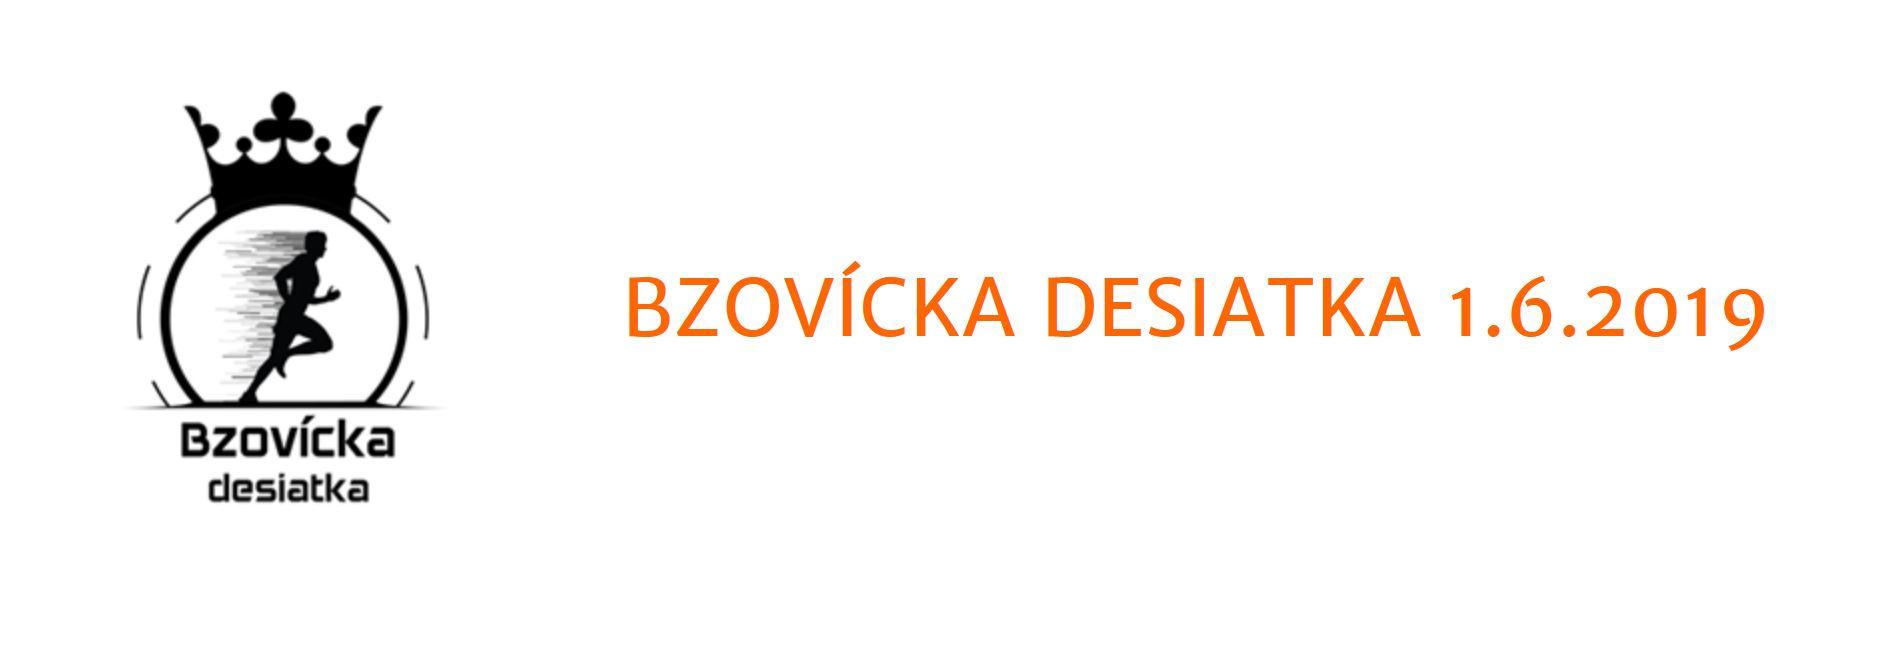 Bzovícka desiatka